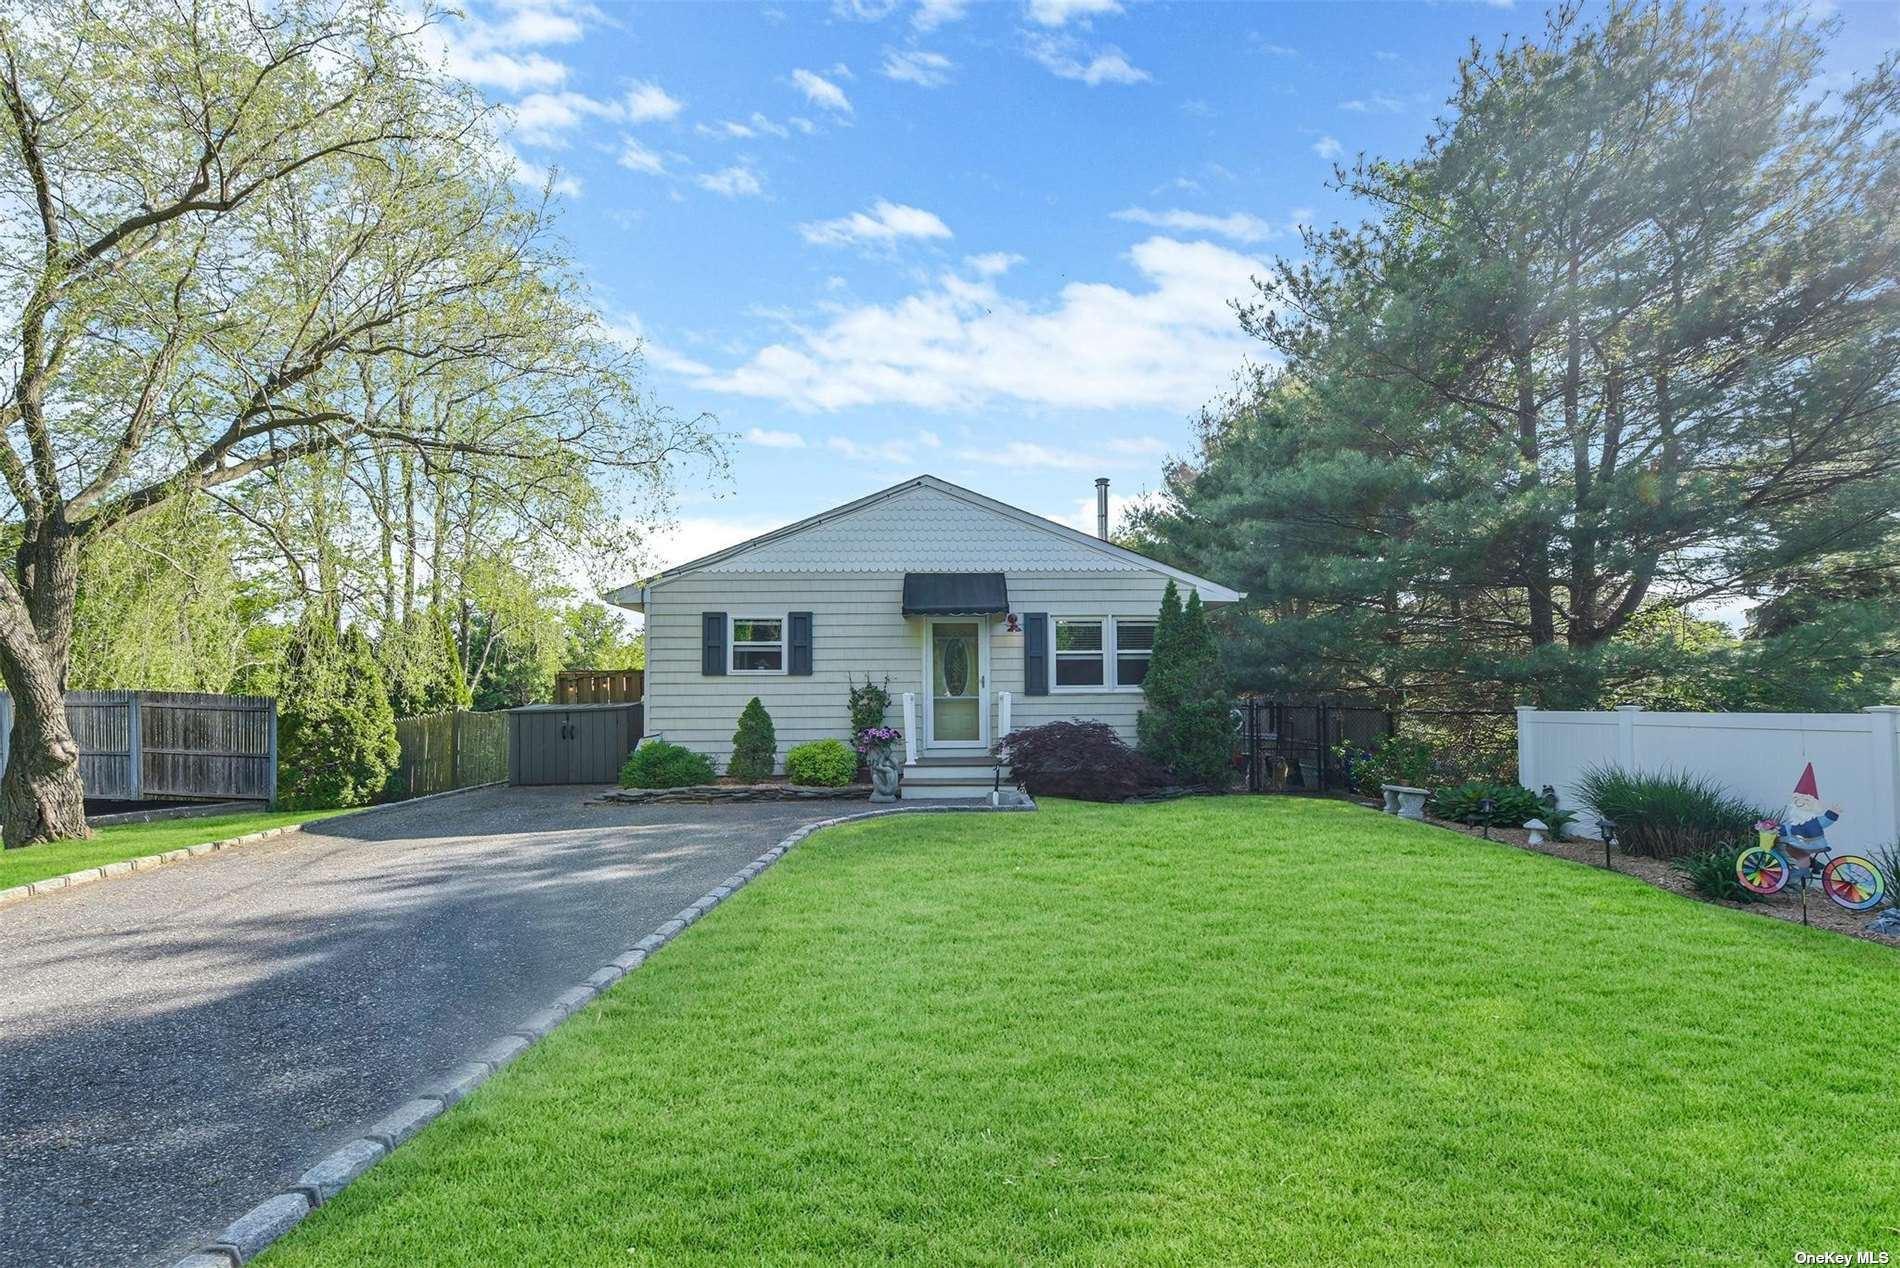 186 Eastport Manor Road, Manorville, NY 11949 - MLS#: 3315052